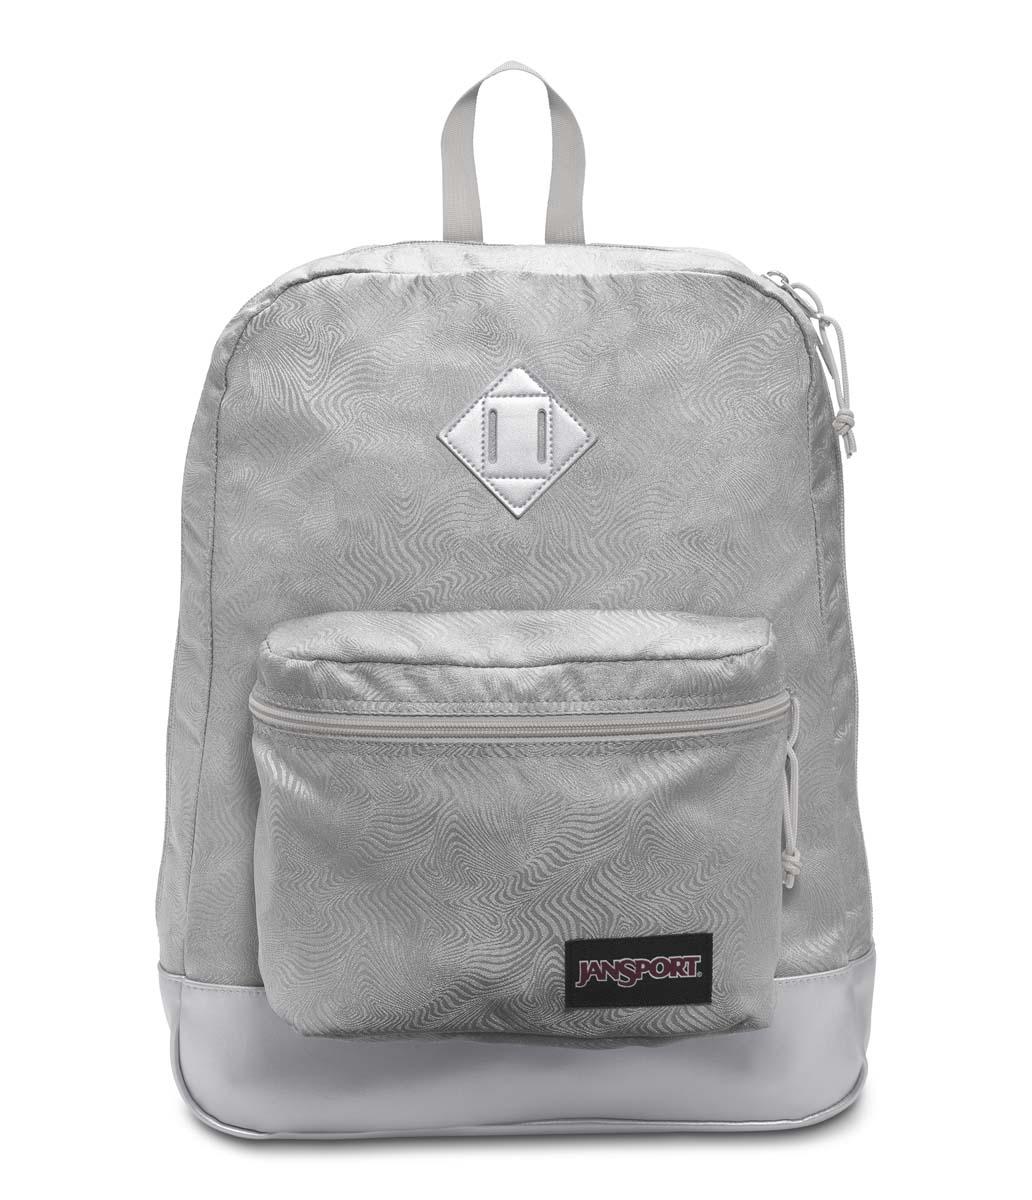 JanSport กระเป๋าเป้ รุ่น Super FX - Silver Psychedelic